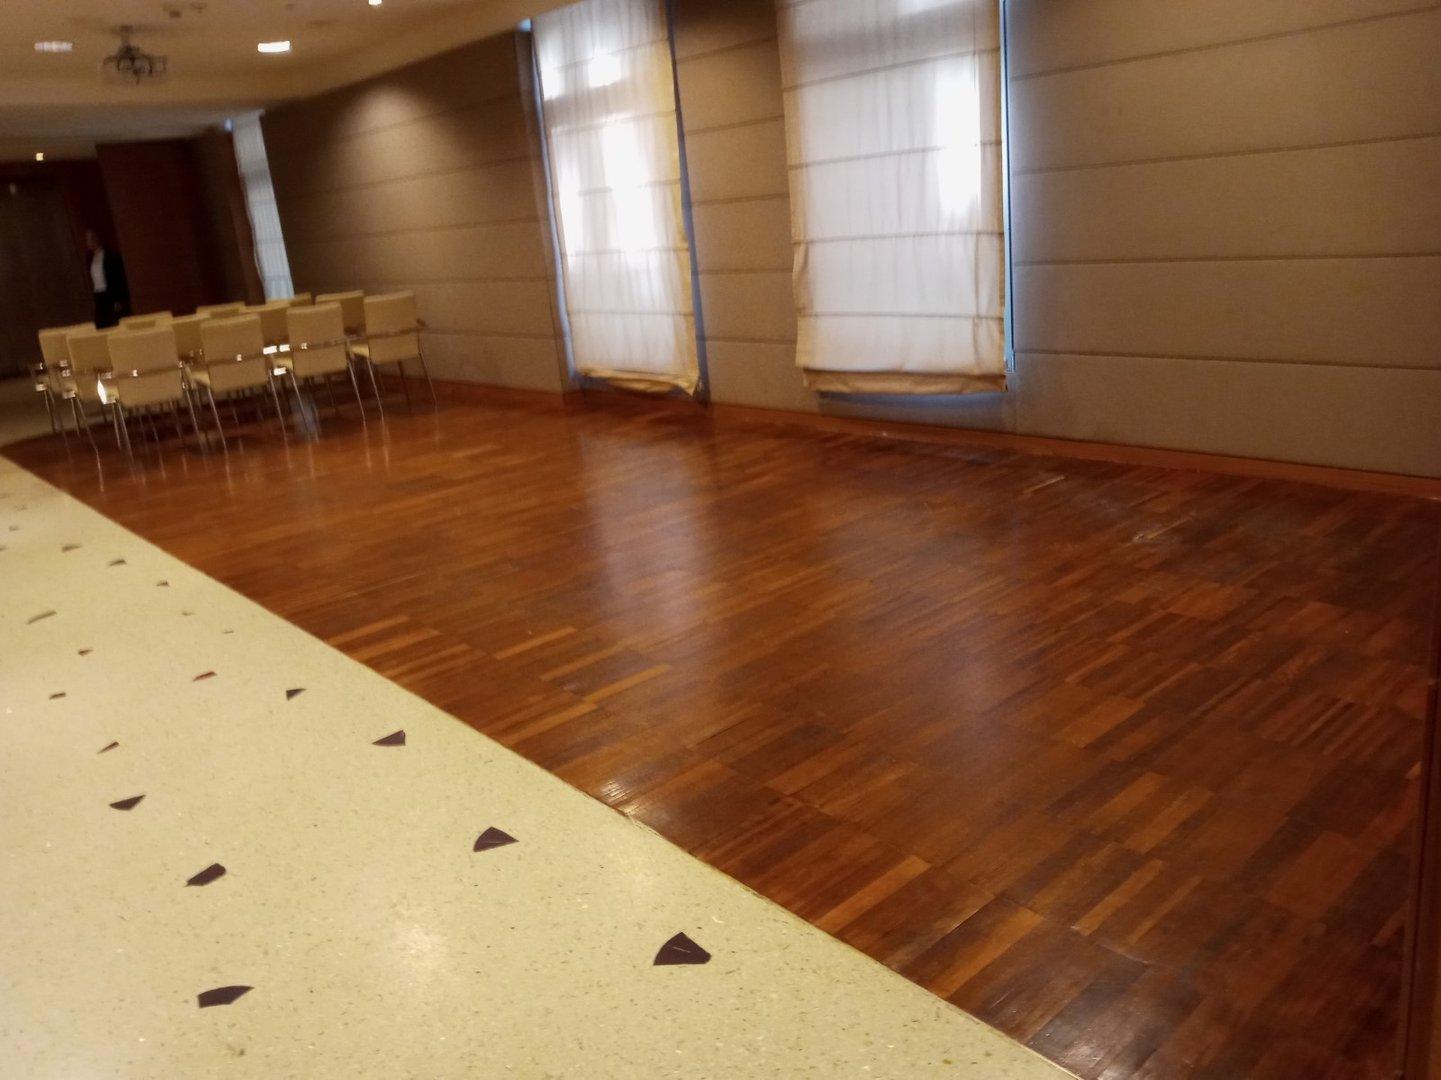 Cloakroom interior